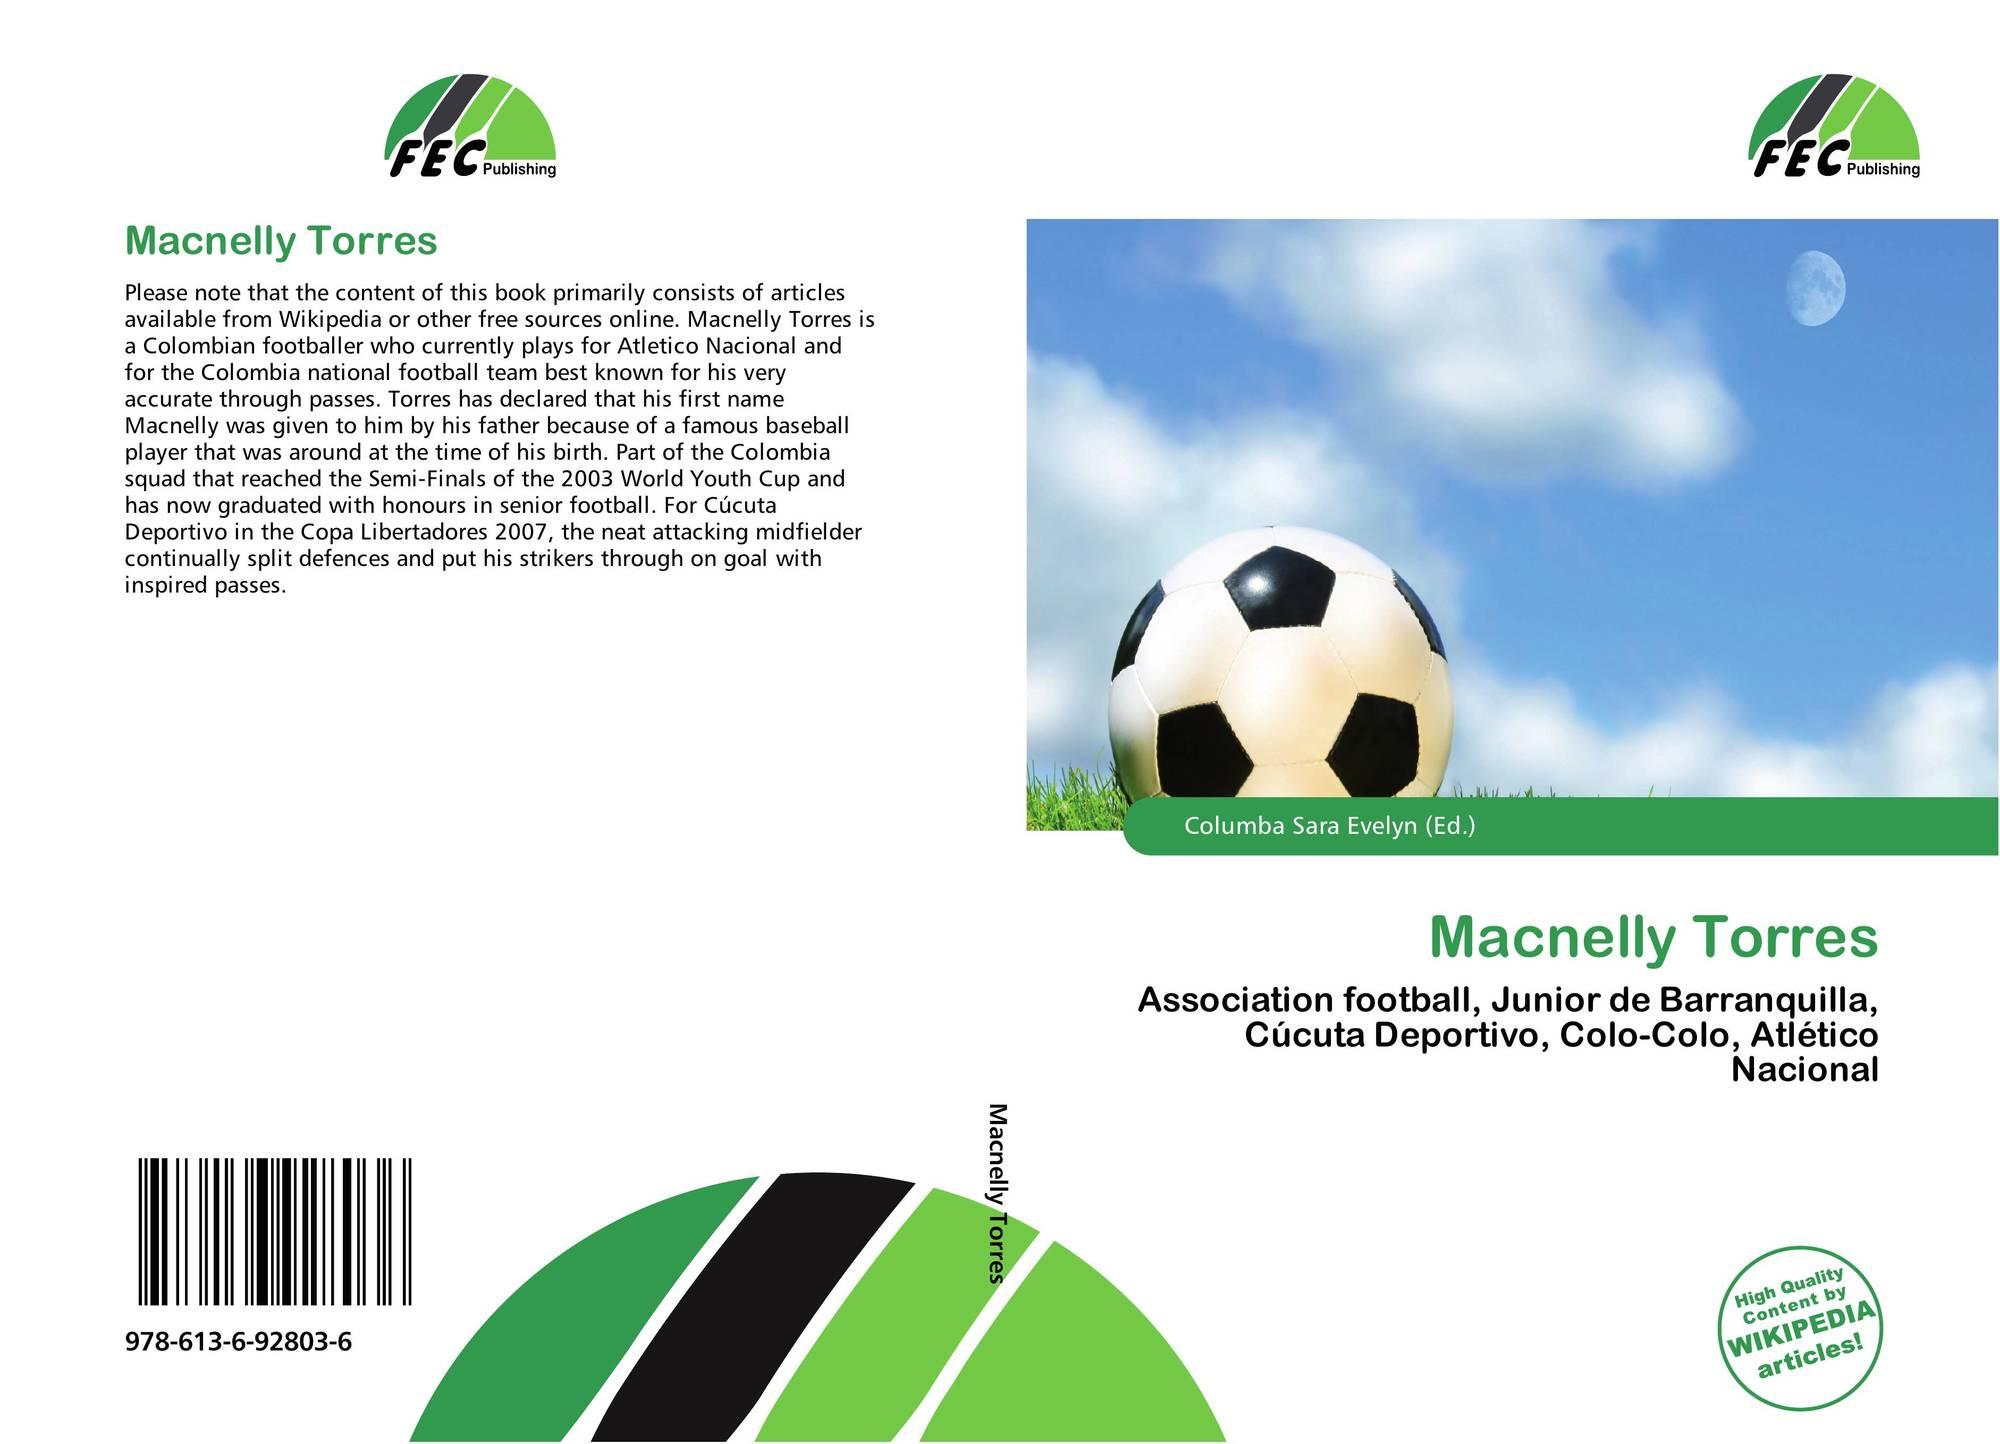 Macnelly Torres 978 613 6 92803 6 6136928035 9786136928036